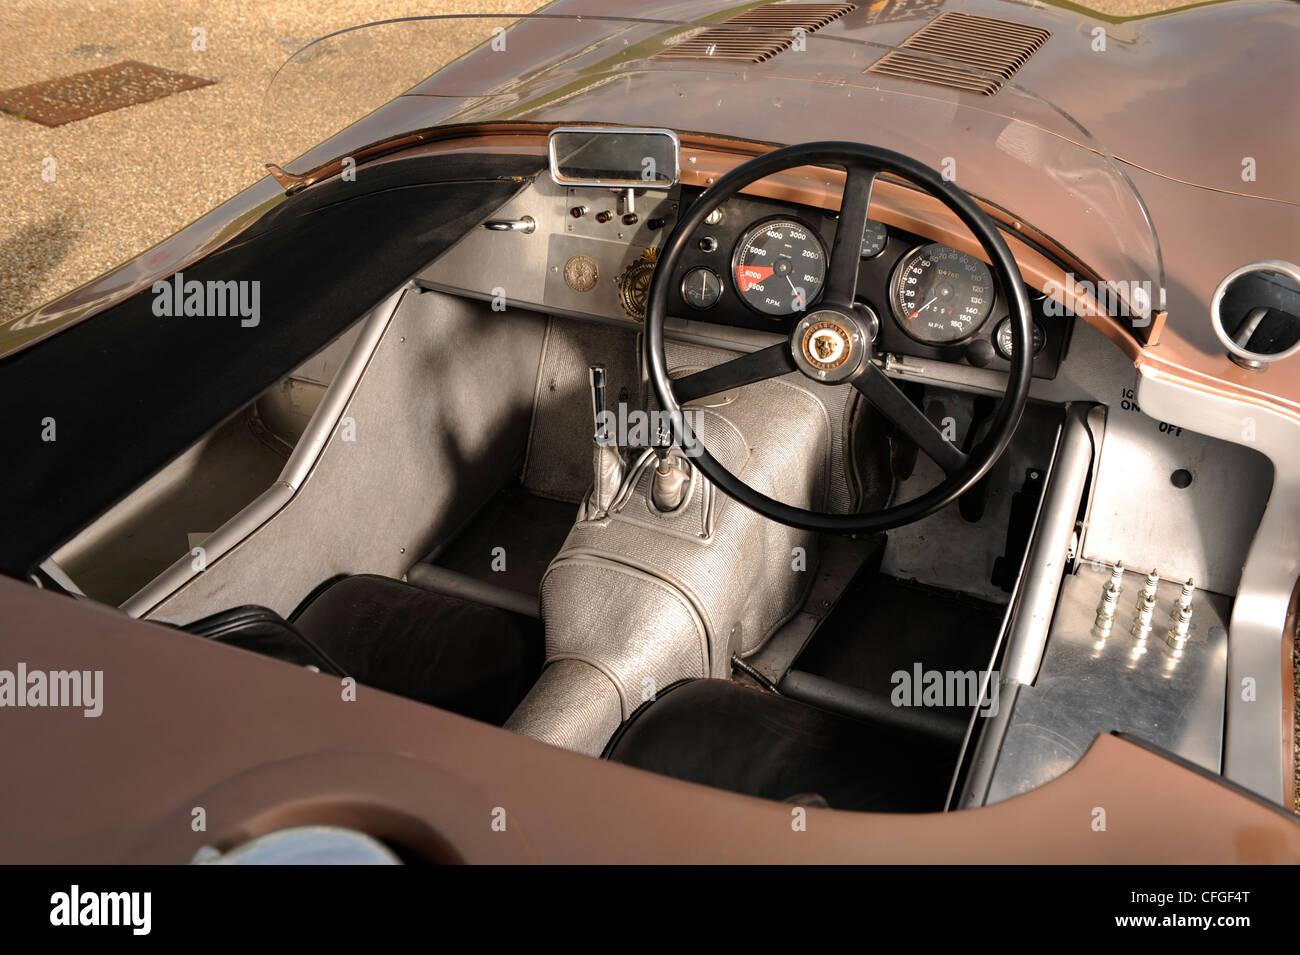 1956 Jaguar C type - Stock Image